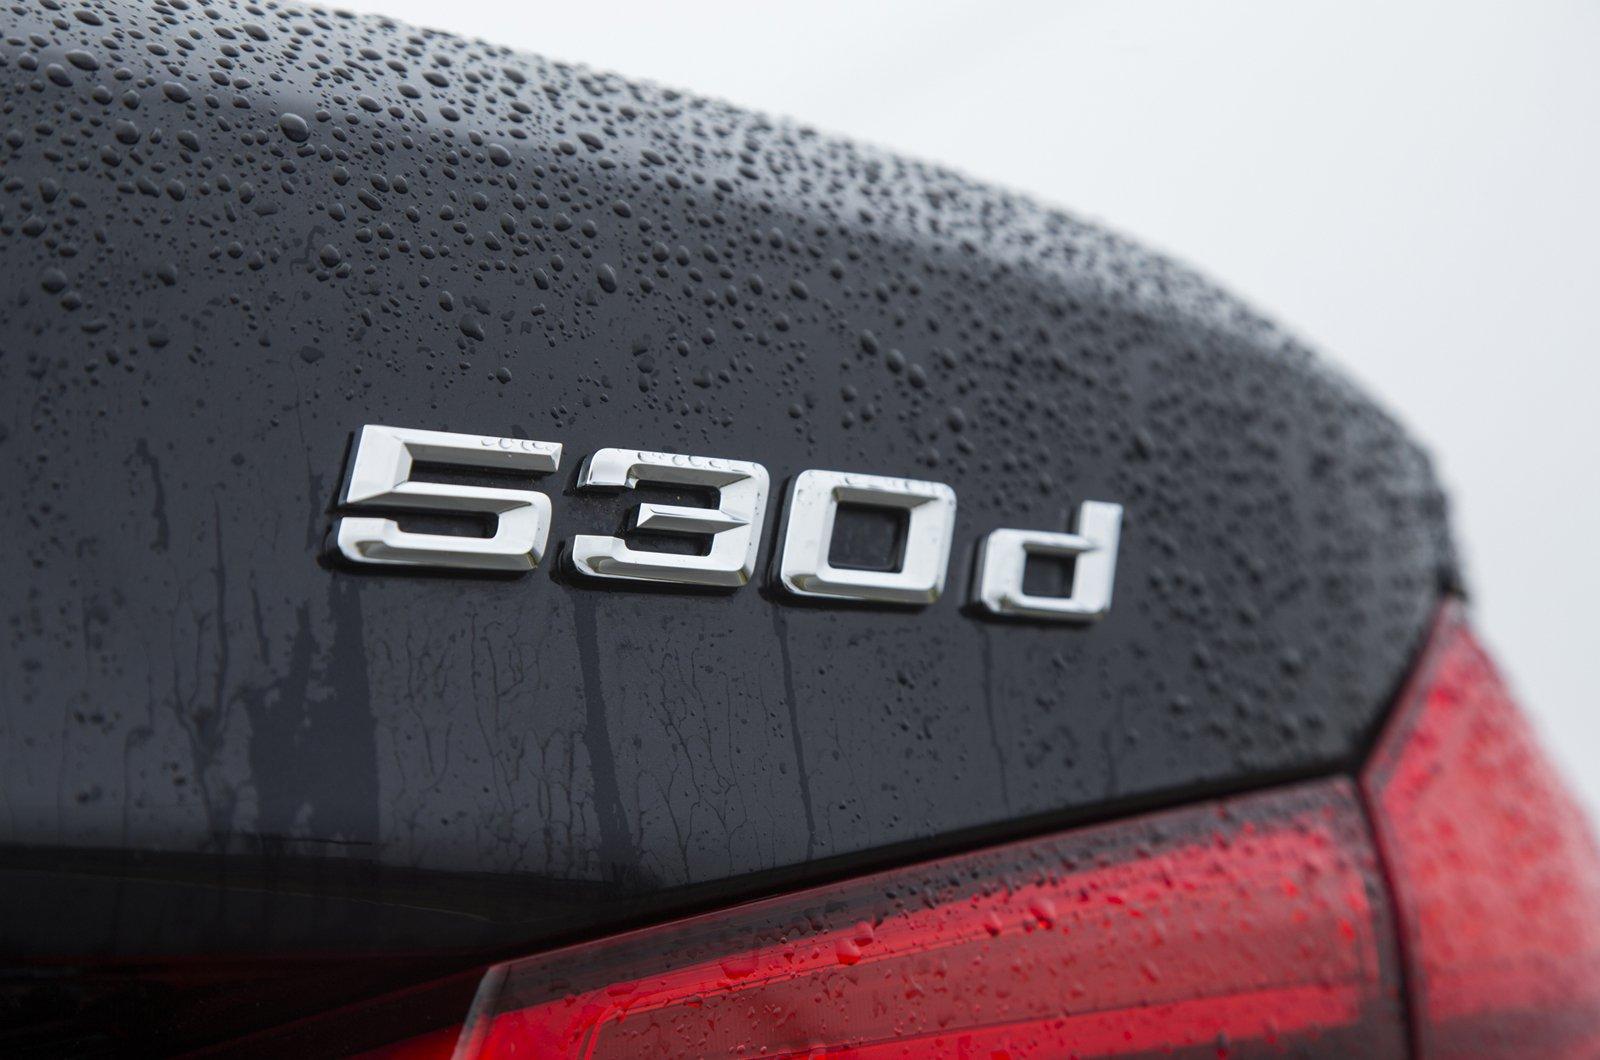 BMW 530d badge